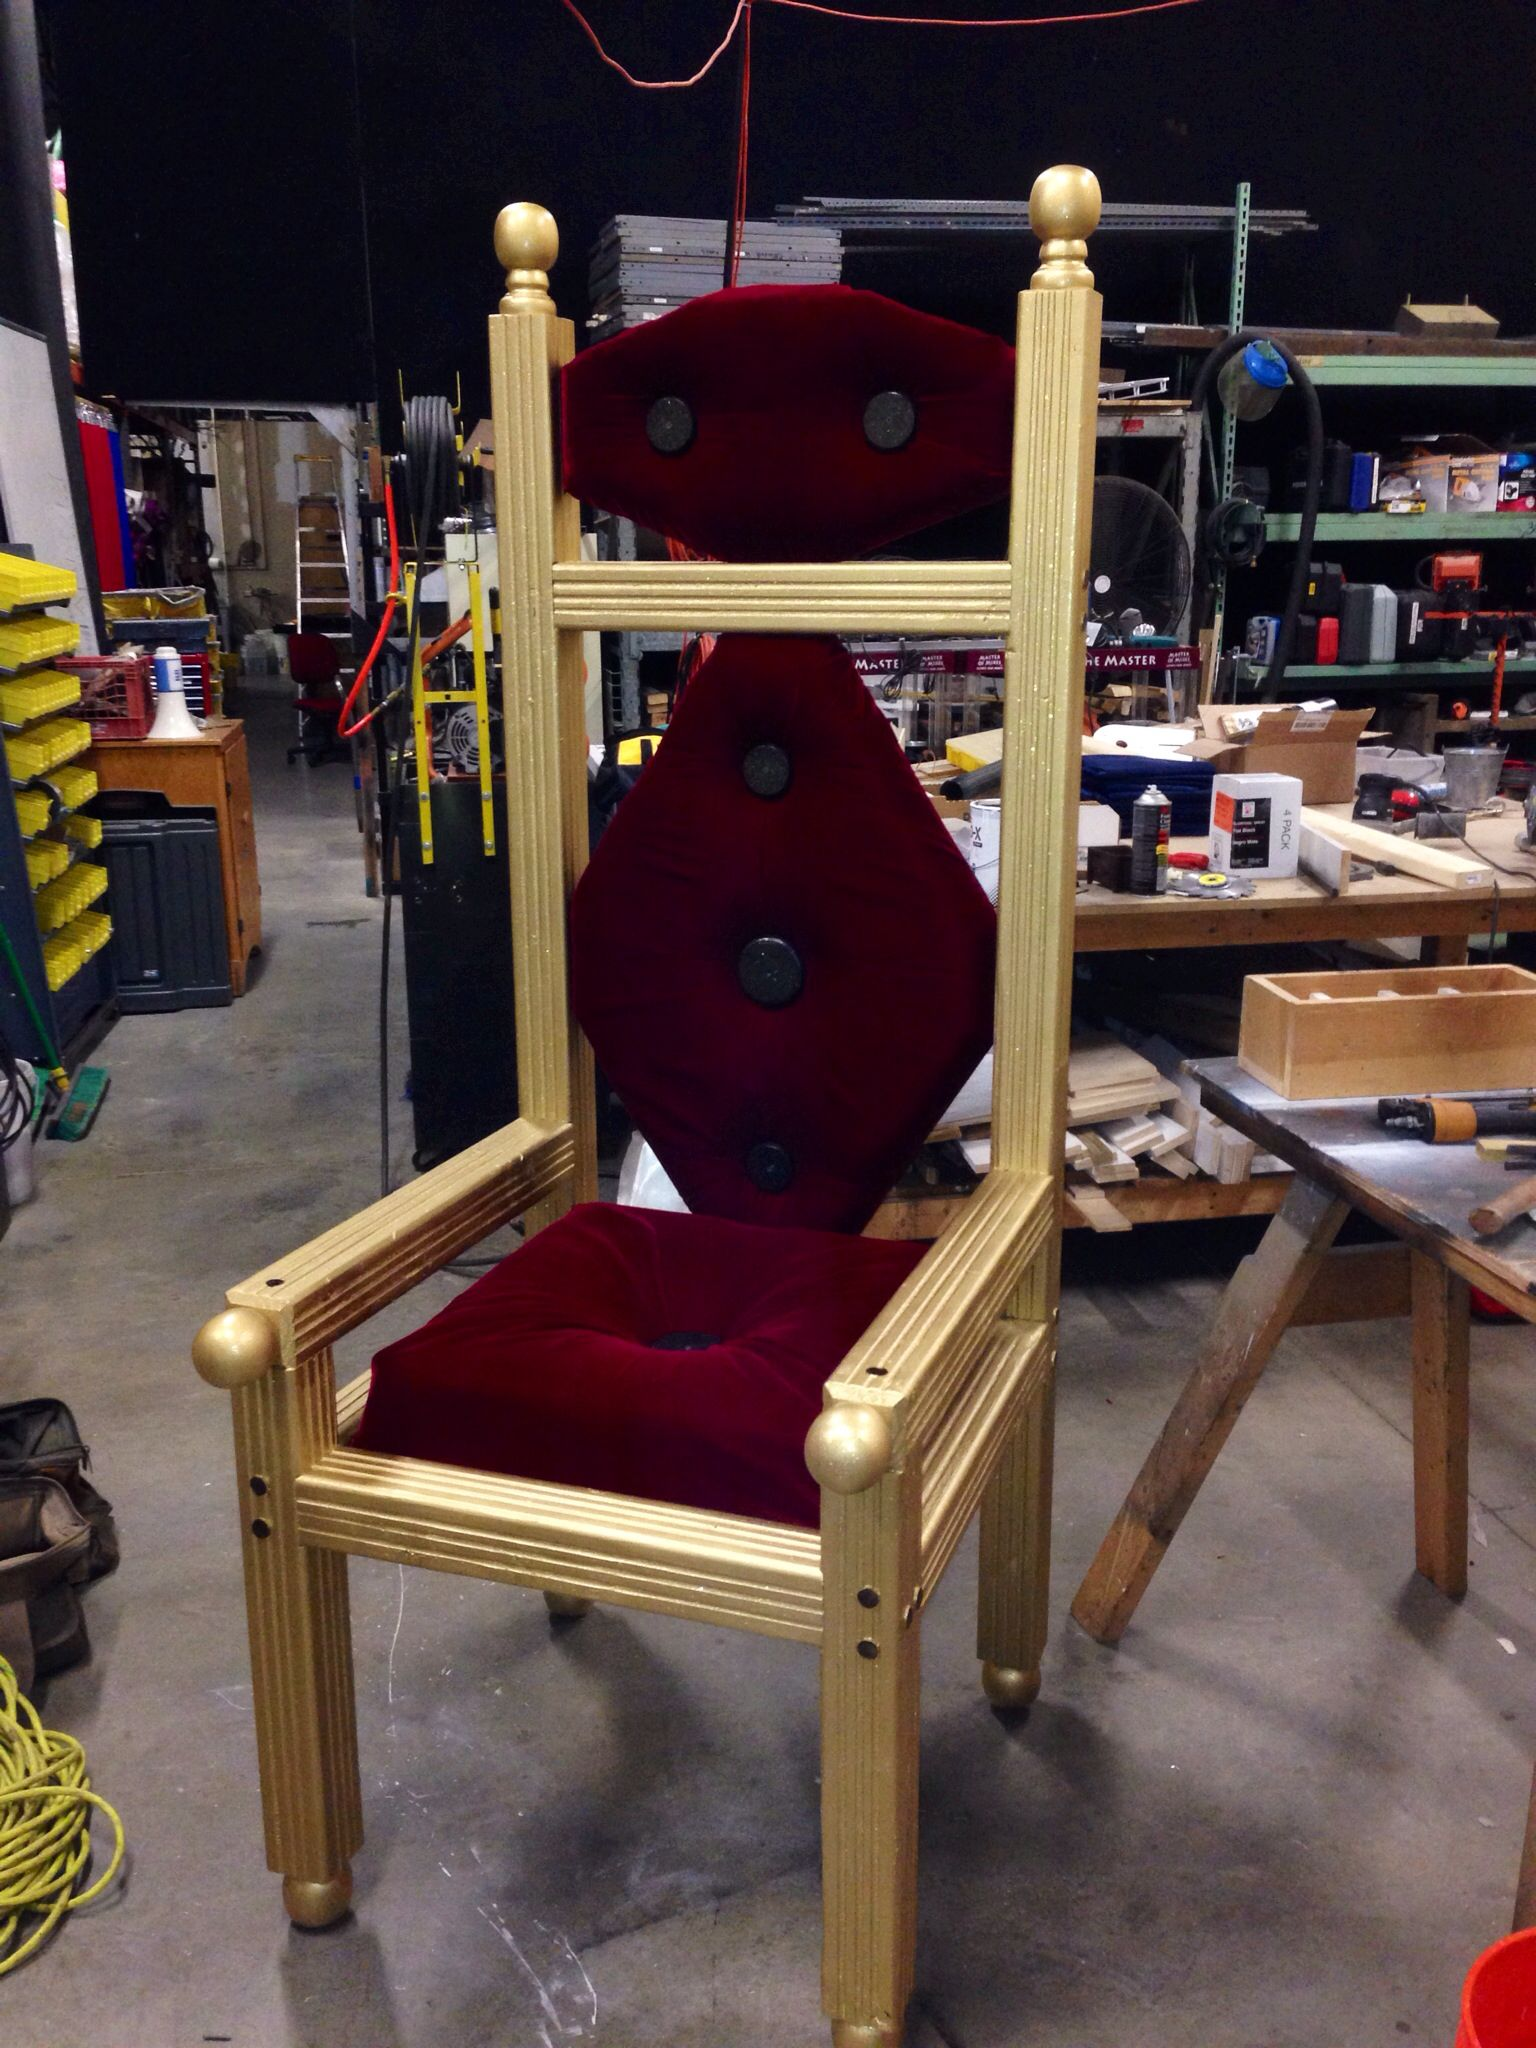 davidlopezfilms how to build a chair